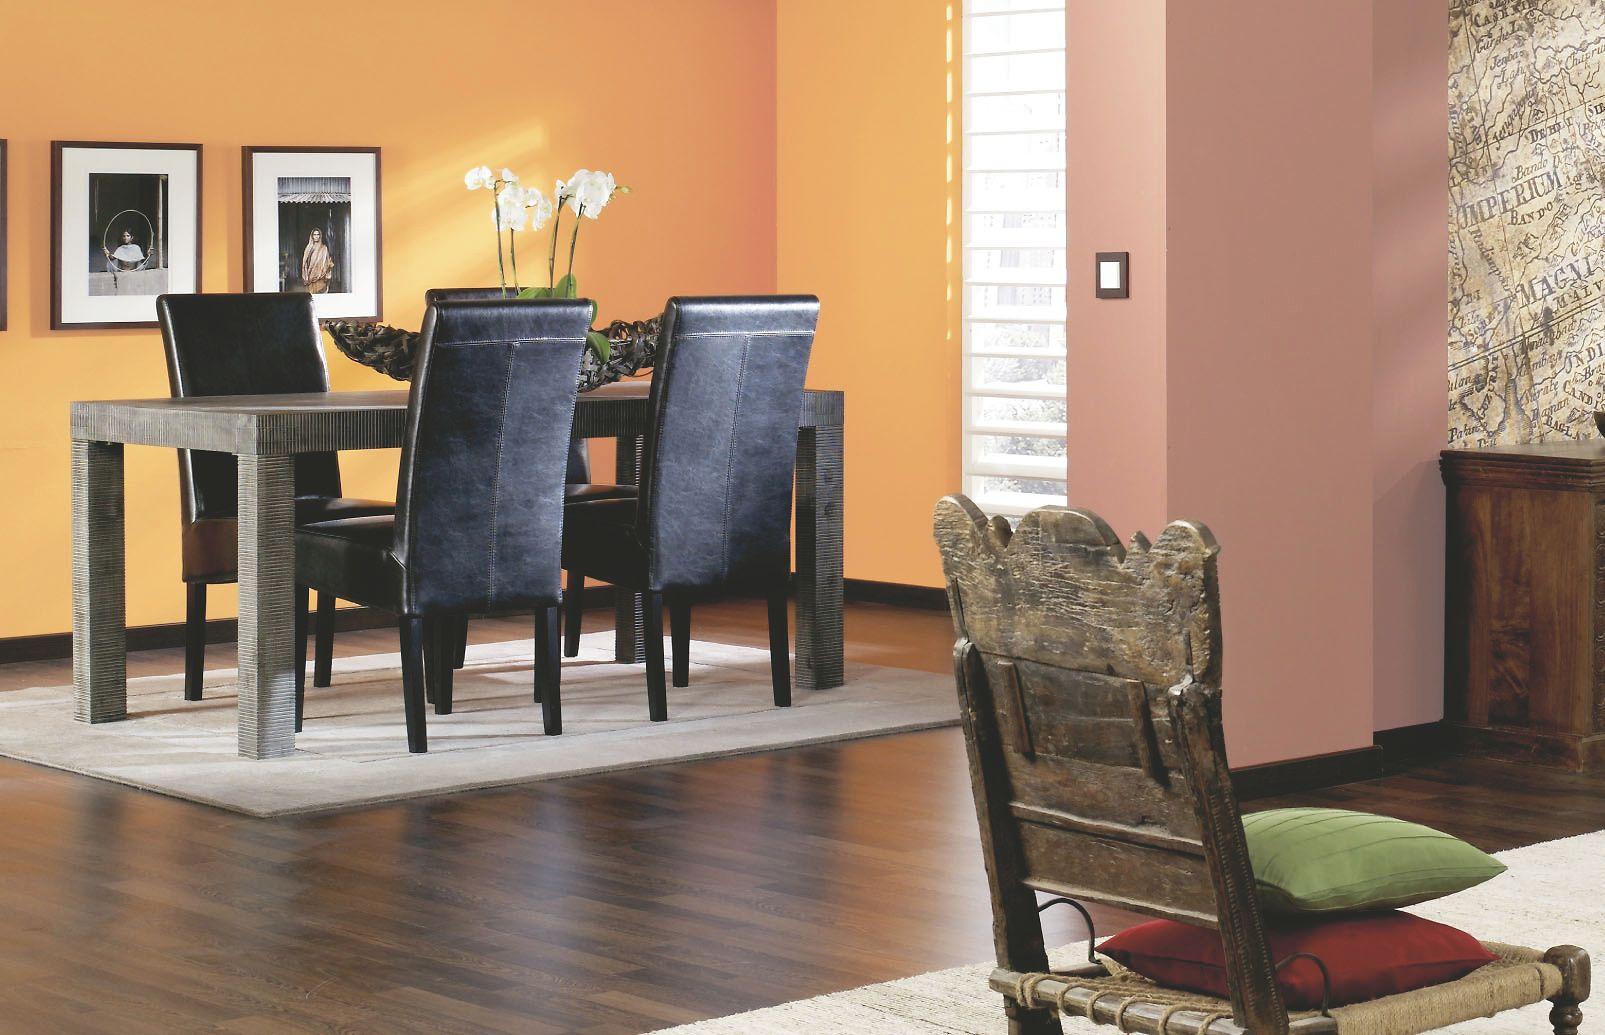 Wohnzimmer Farben Dunkle Mobel Living Room Designs Home Decor